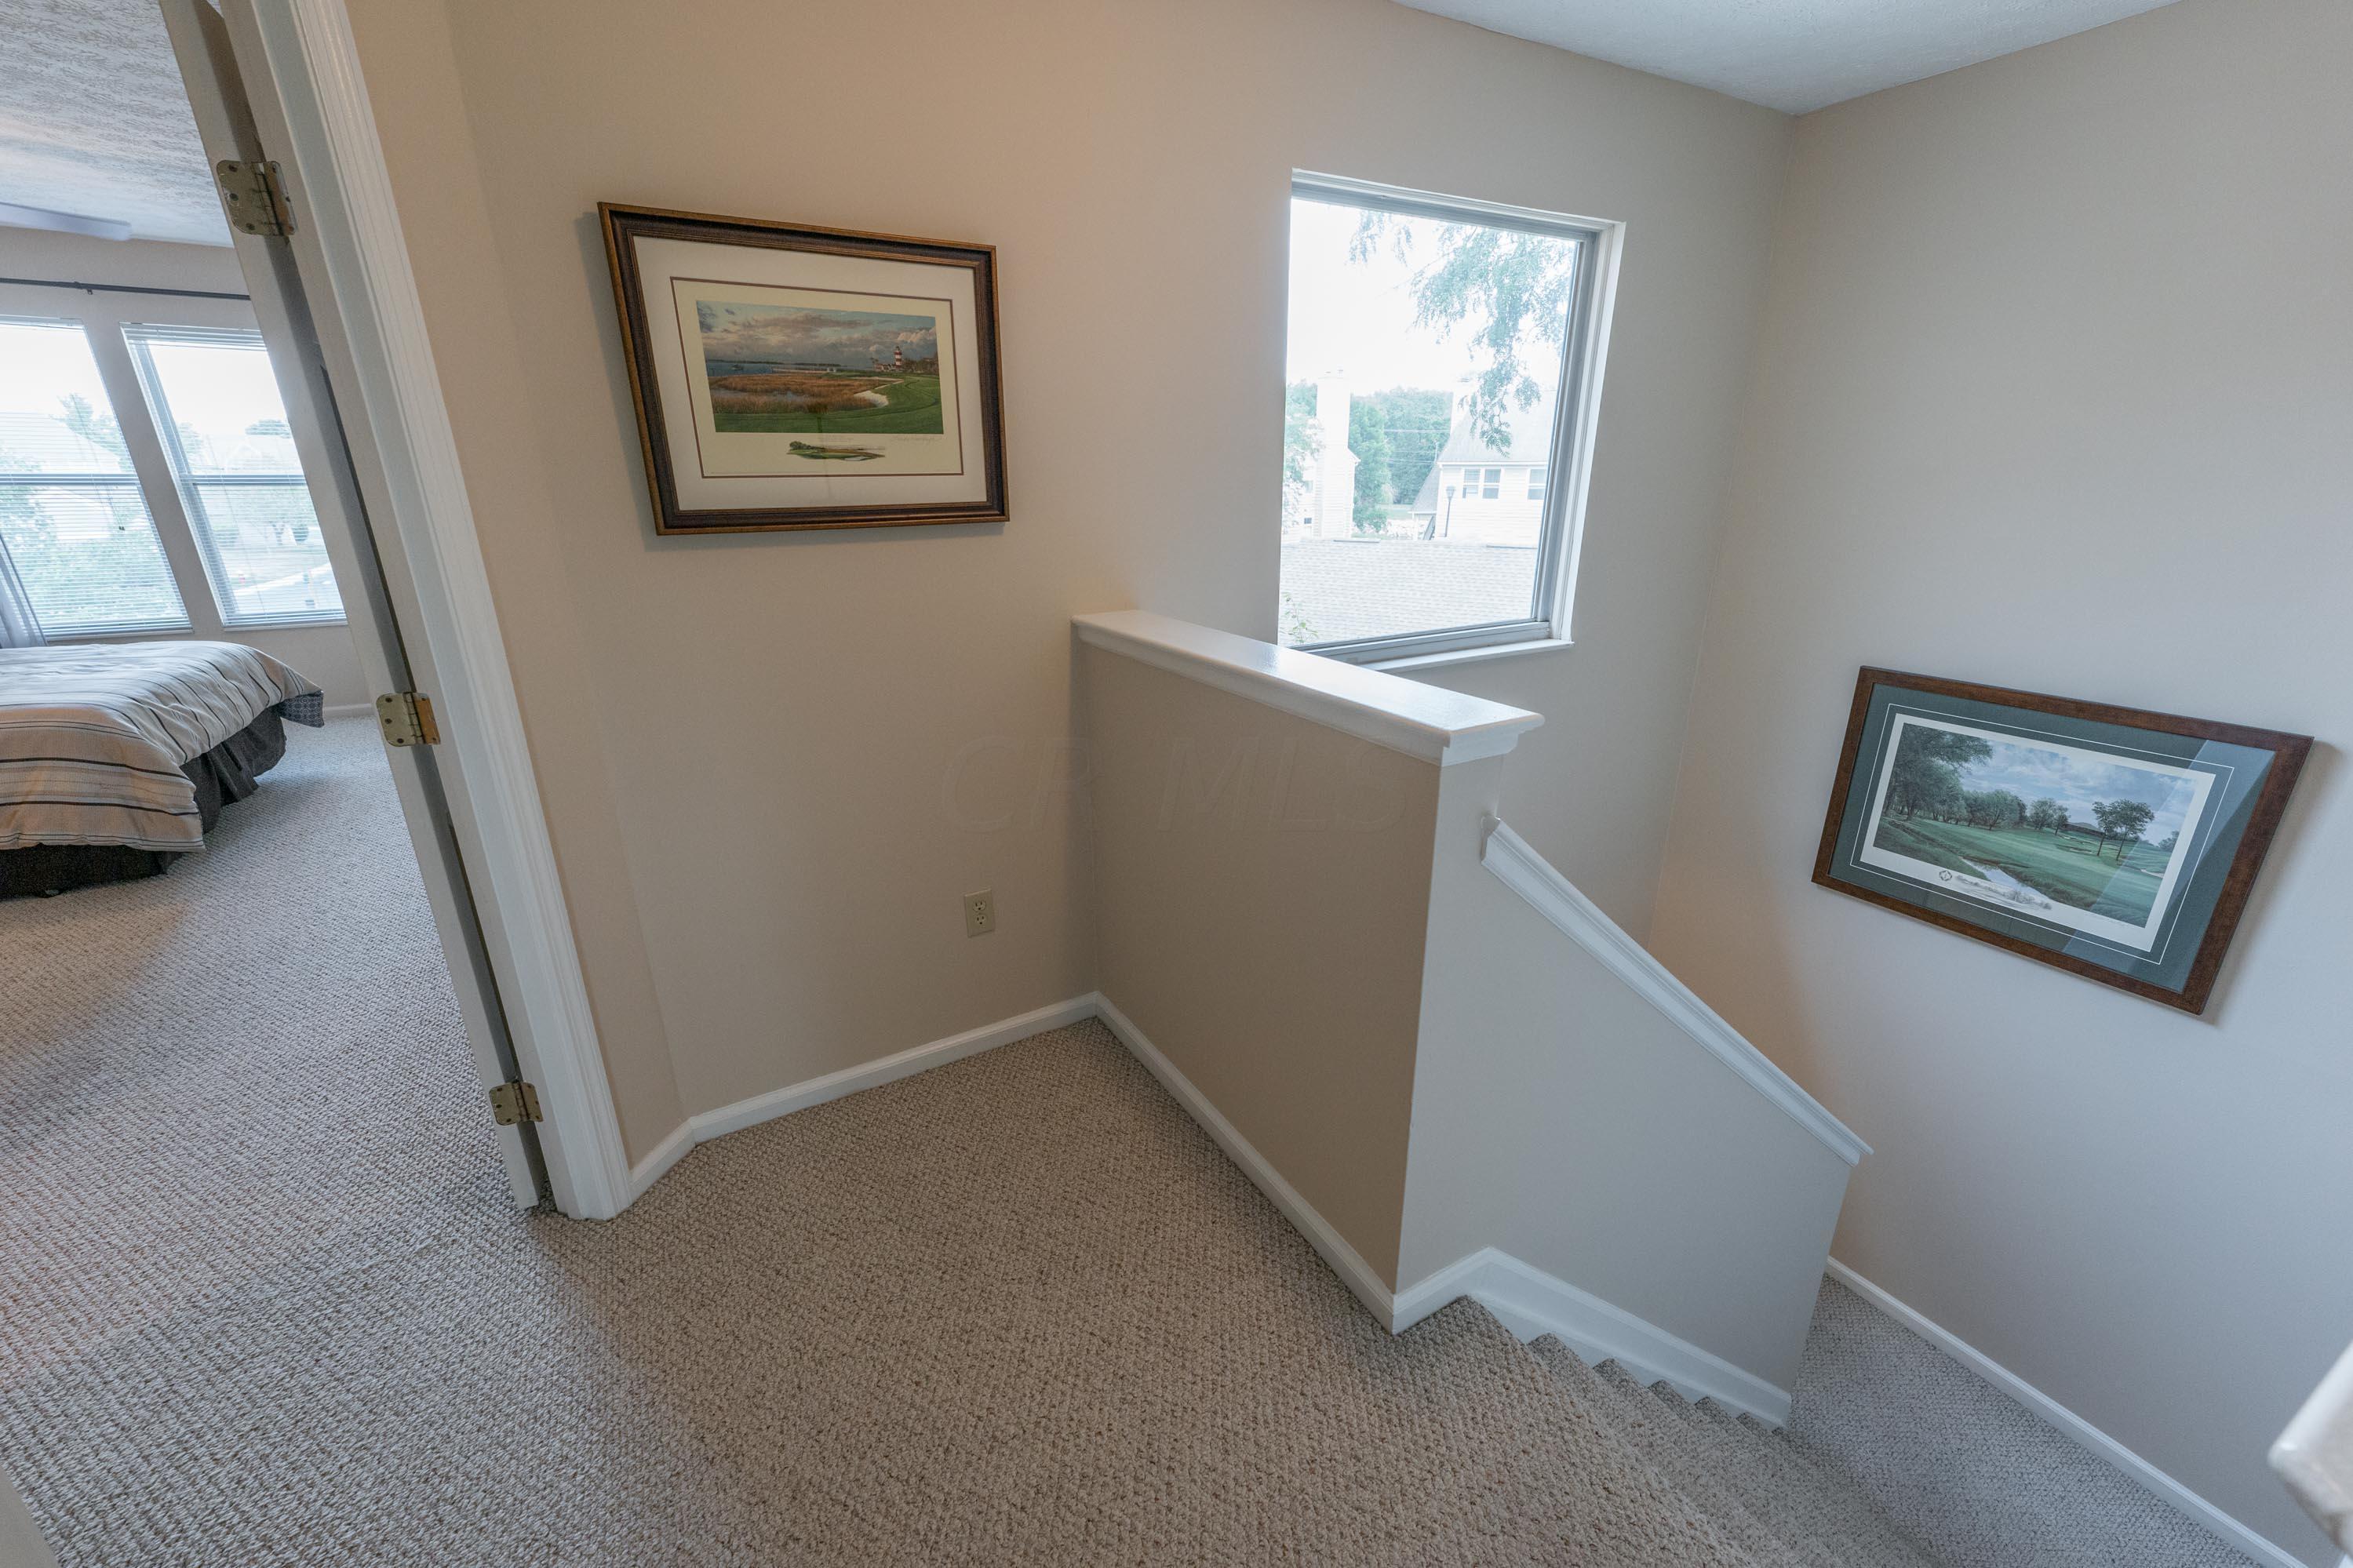 3646 Hilliard Station Road, Hilliard, Ohio 43026, 2 Bedrooms Bedrooms, ,3 BathroomsBathrooms,Residential,For Sale,Hilliard Station,220031758